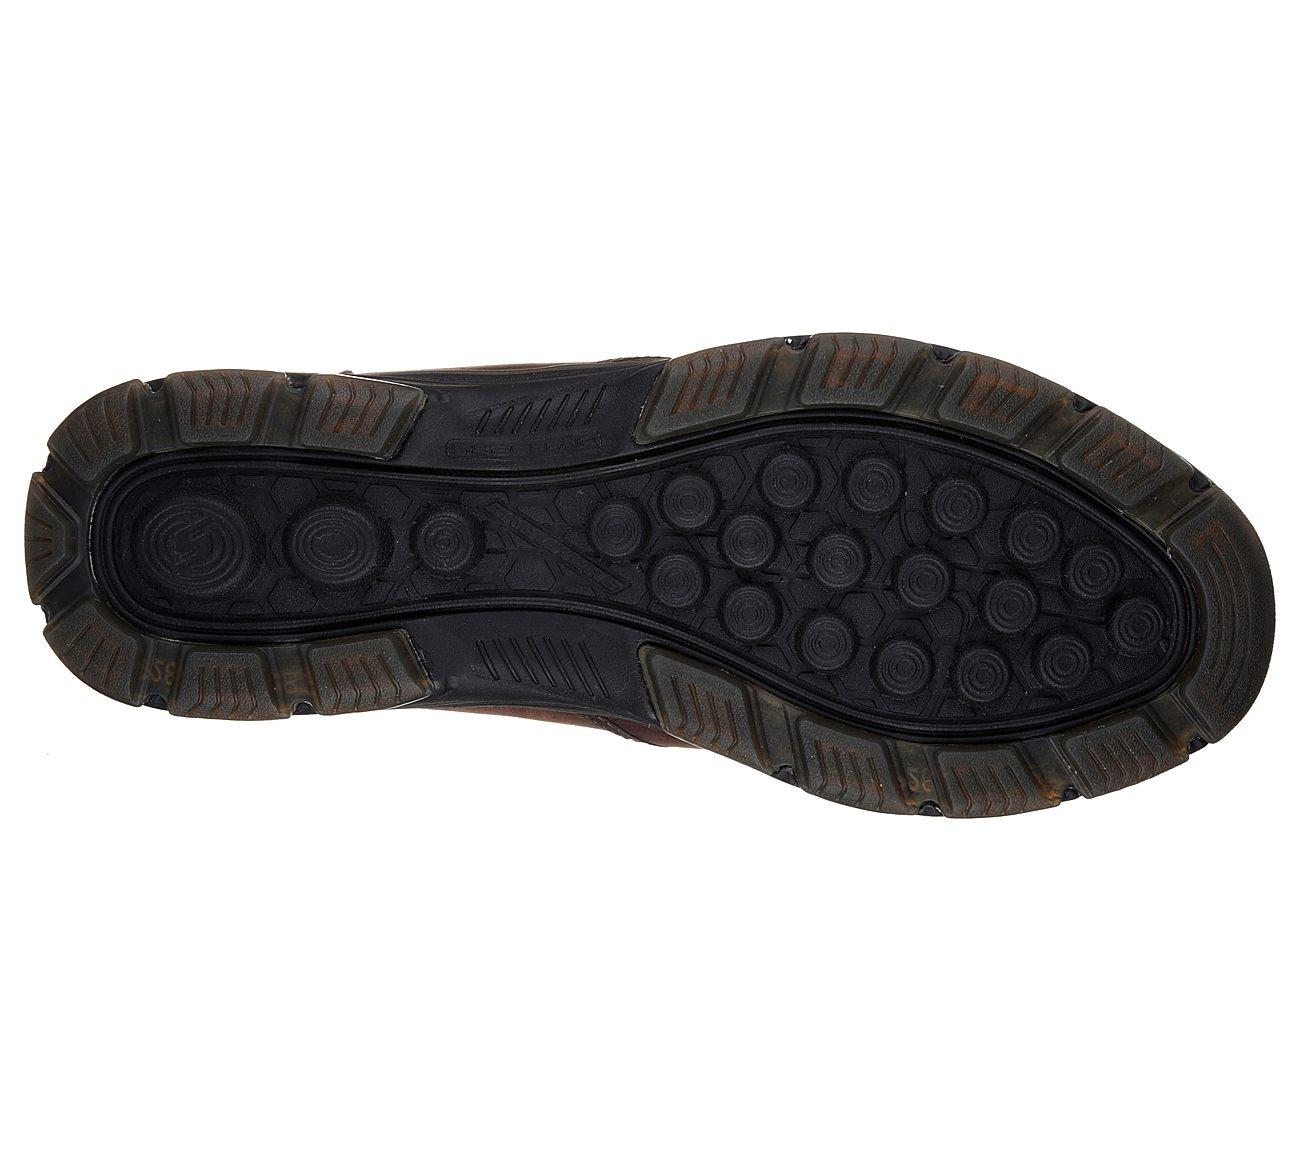 Buy SKECHERS Garton Keven Skech Air Shoes 9uxQv